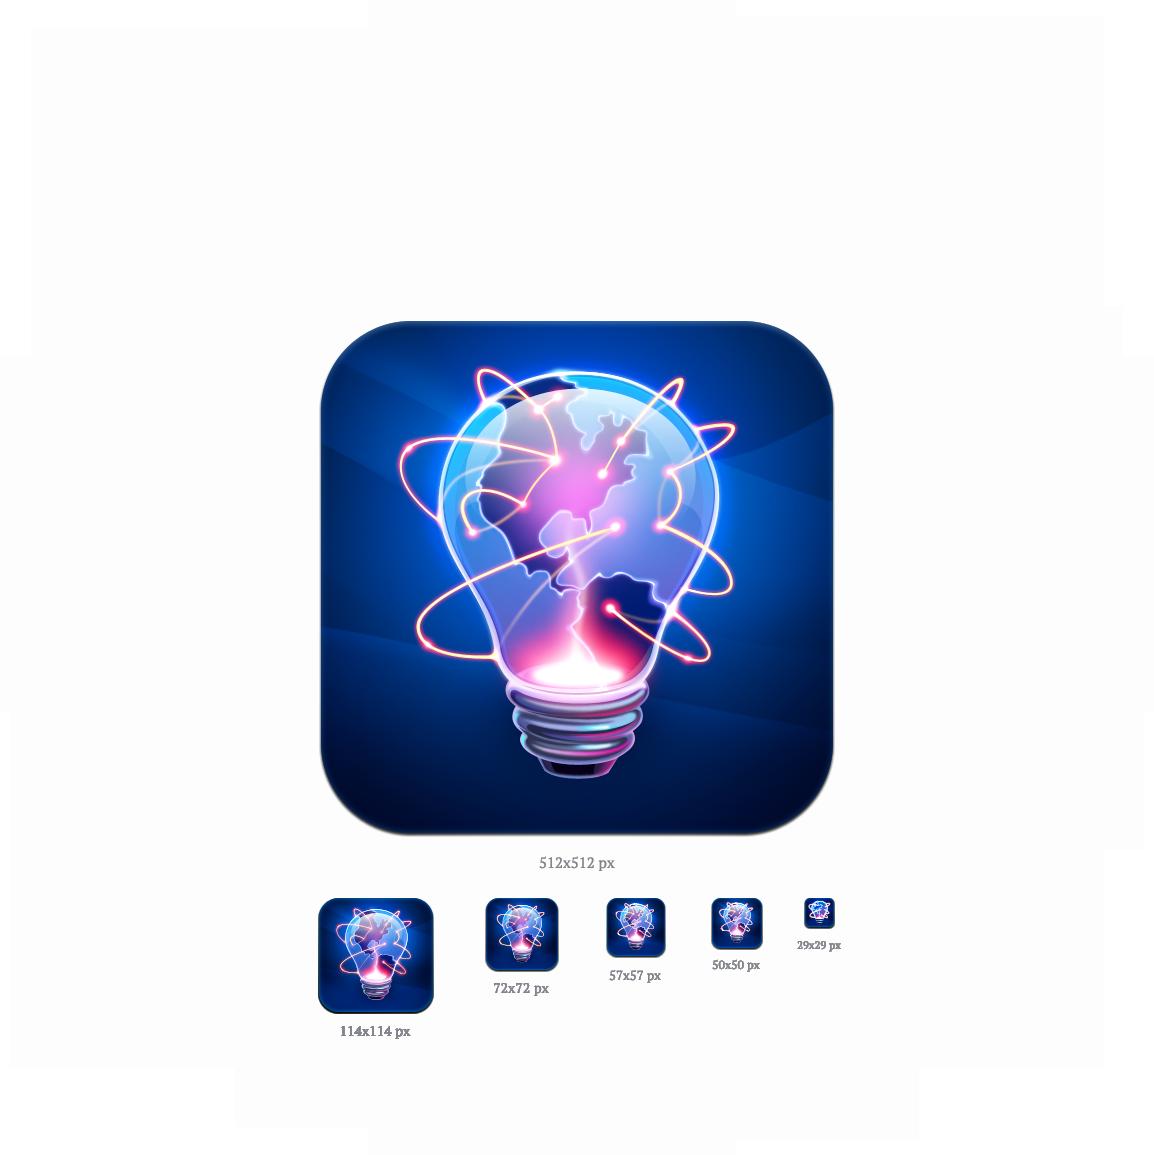 kikinbrowsericon.png 1.154×1.155 pixels Ios app icon